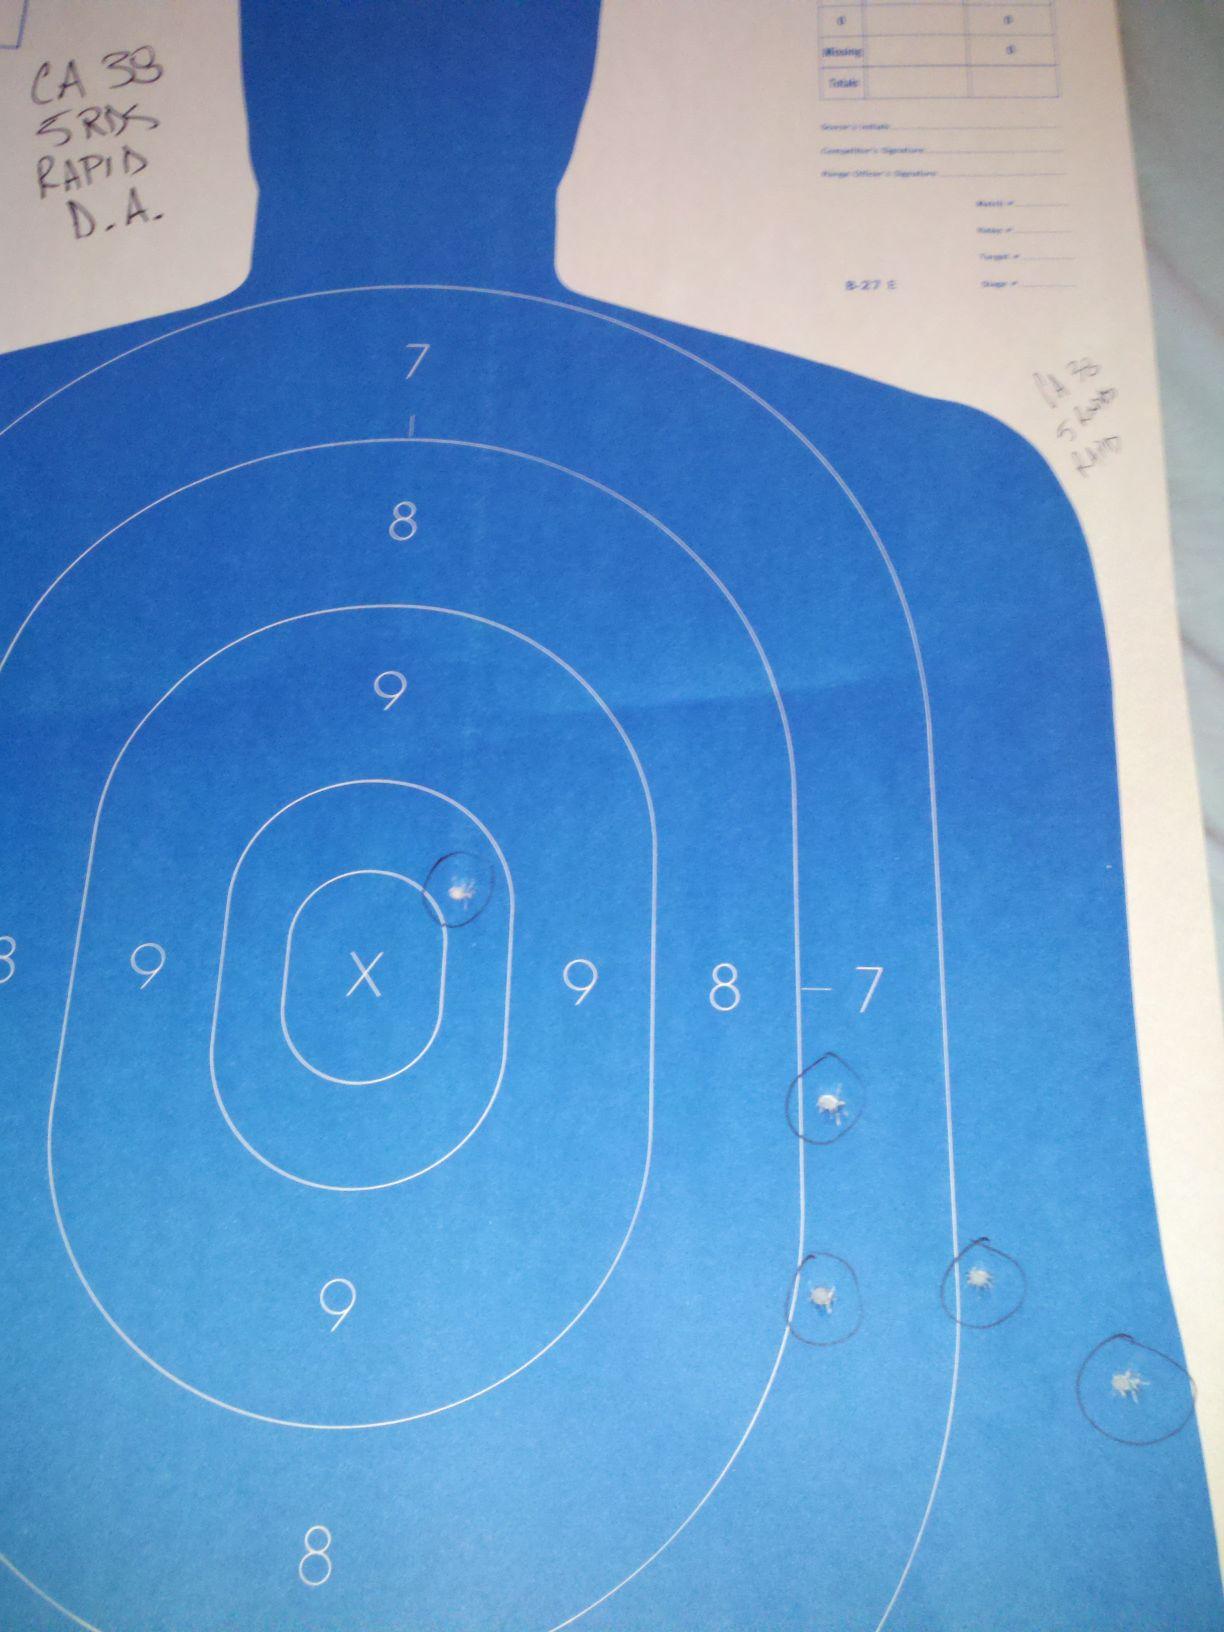 New 649 Range review! Yeah...it was fun!!!-ca38-5rapid-da.jpg